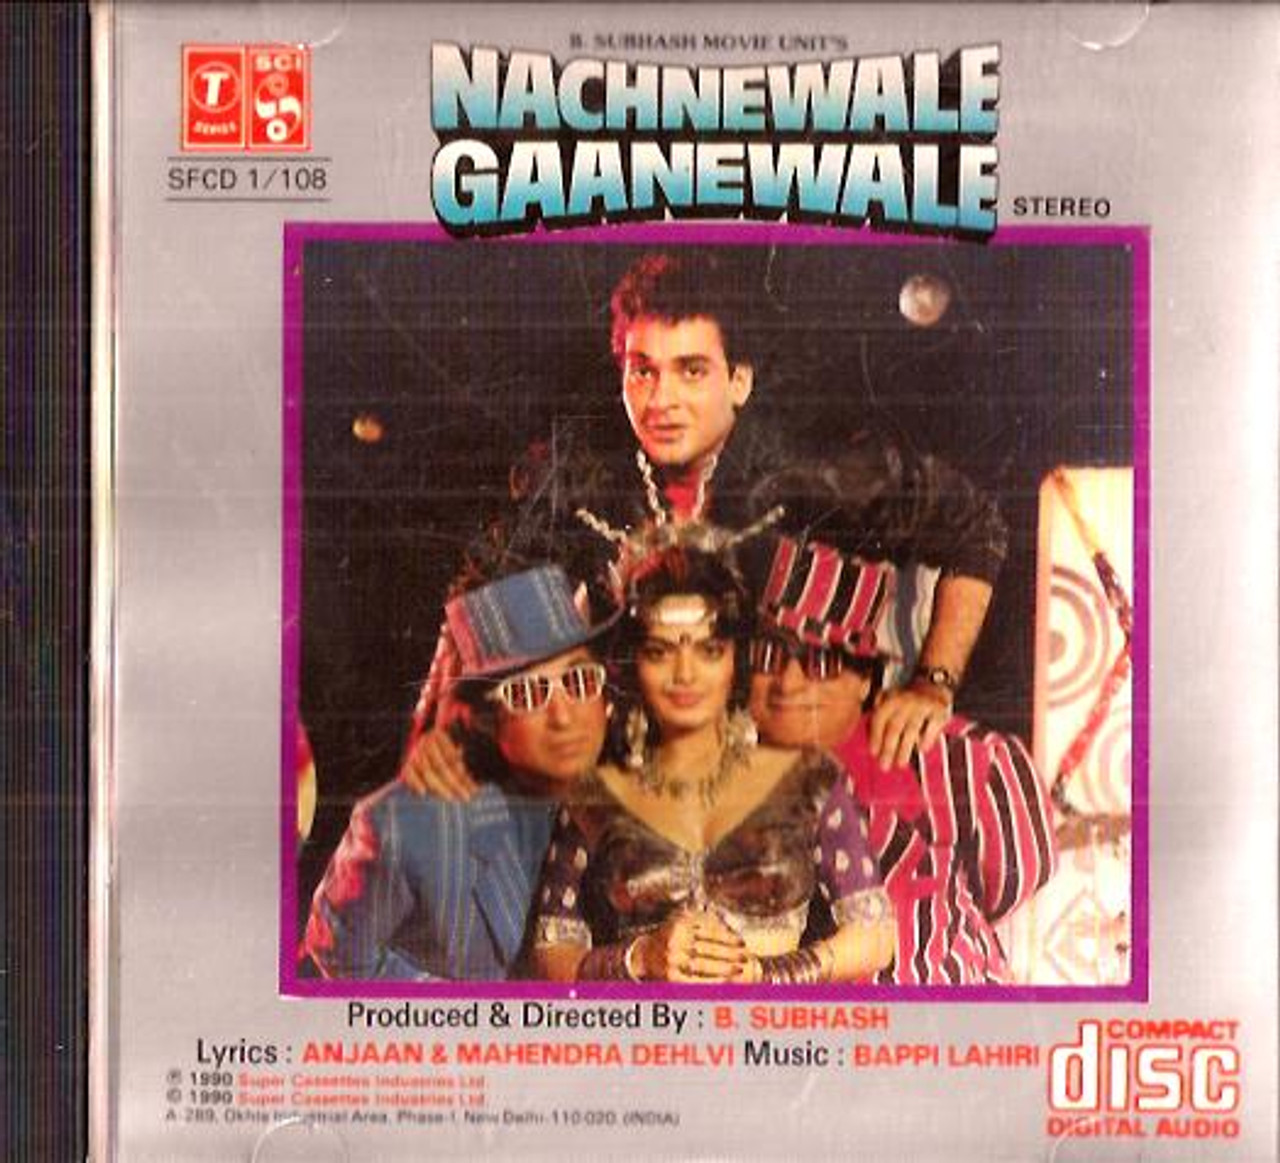 Nachnewale Gaanewale Cd 1990 India Town Gifts